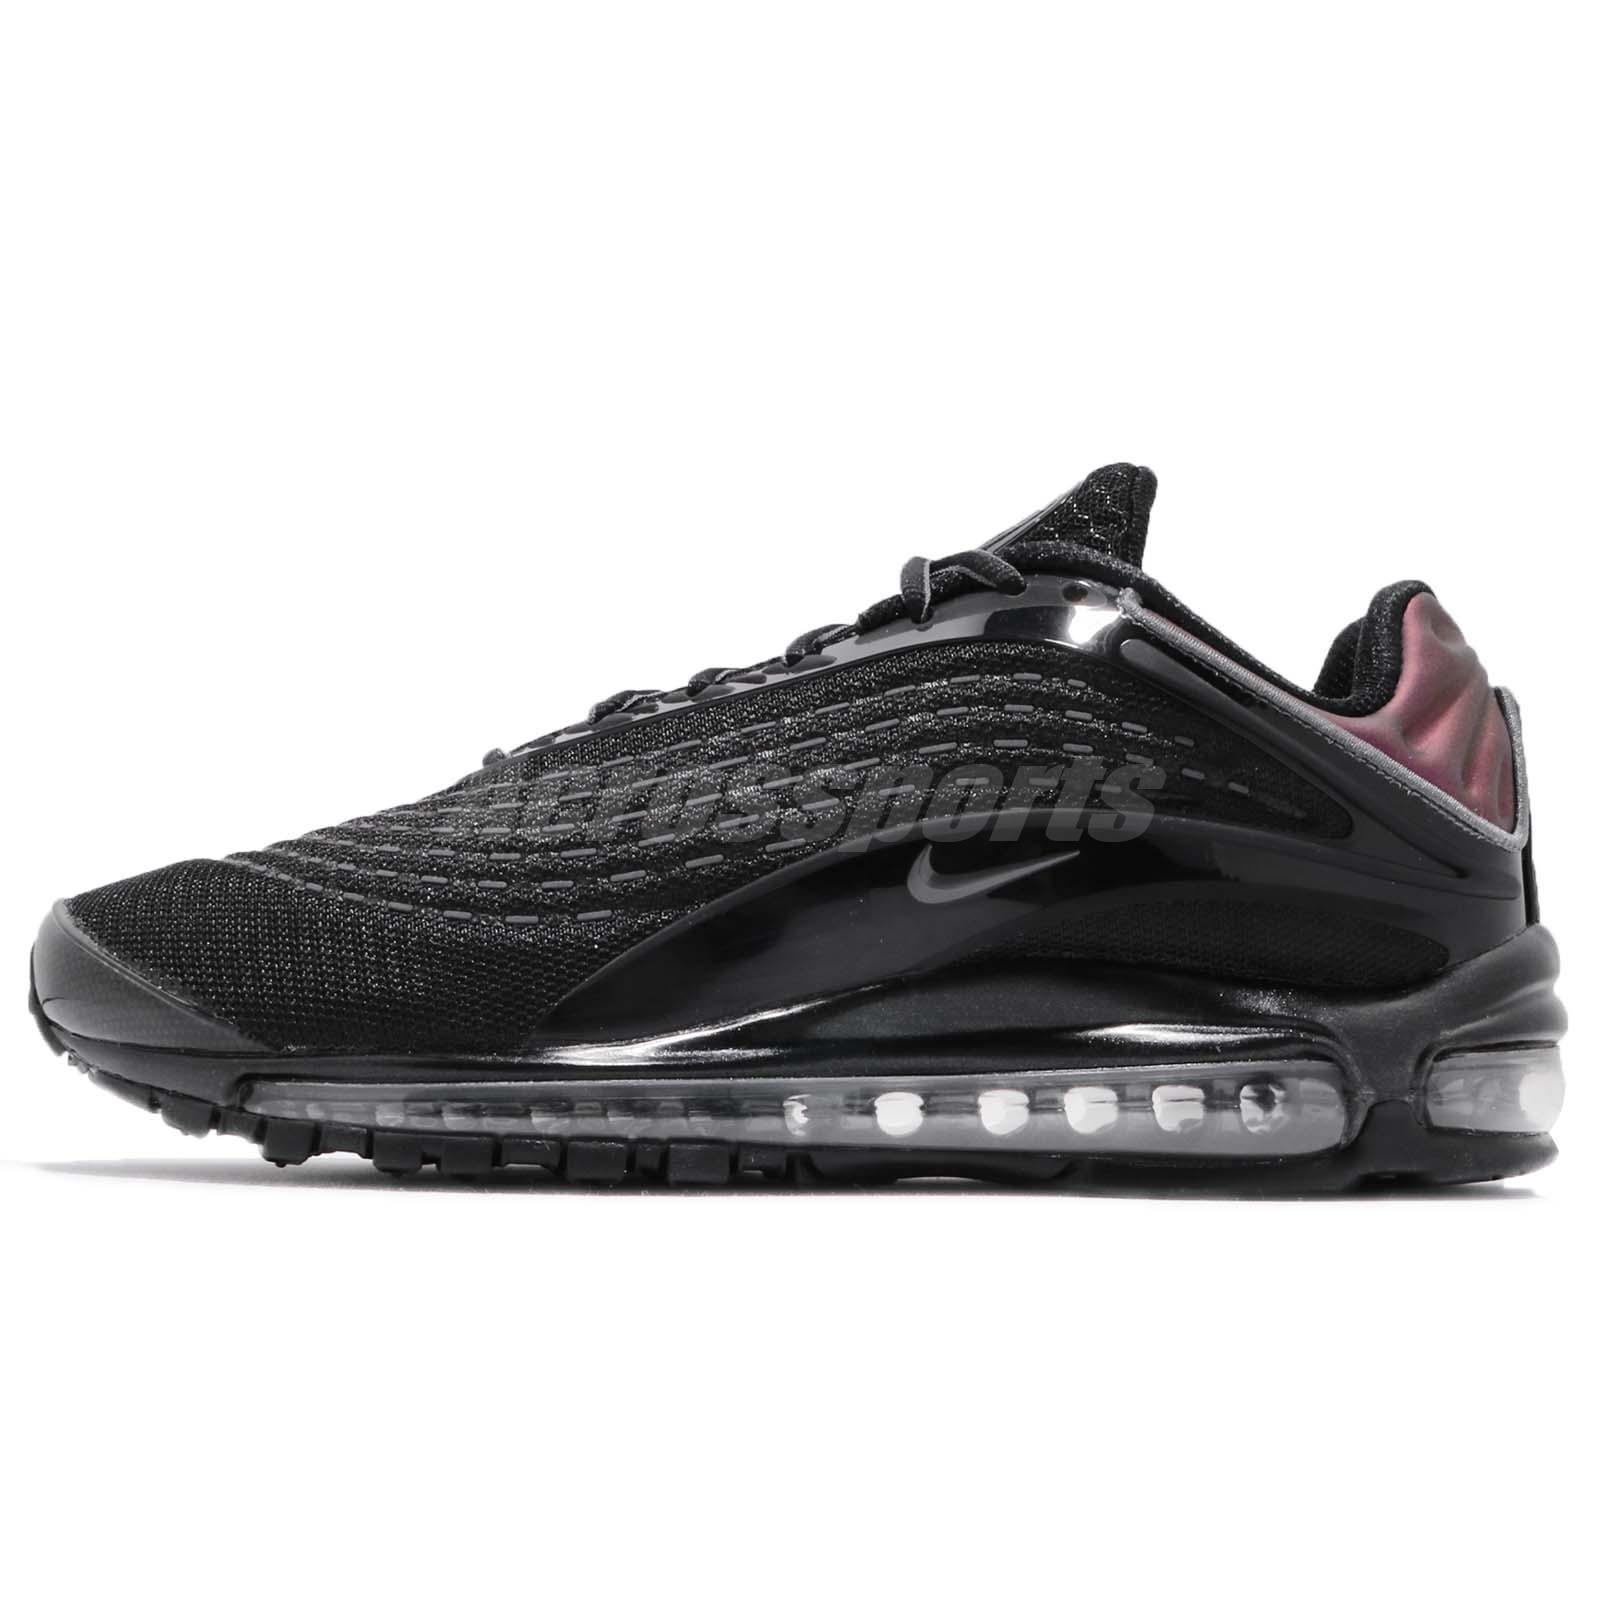 51930133cc Nike Air Max Deluxe Black Bronze Grey Men Running Shoes Sneakers AV2589-001